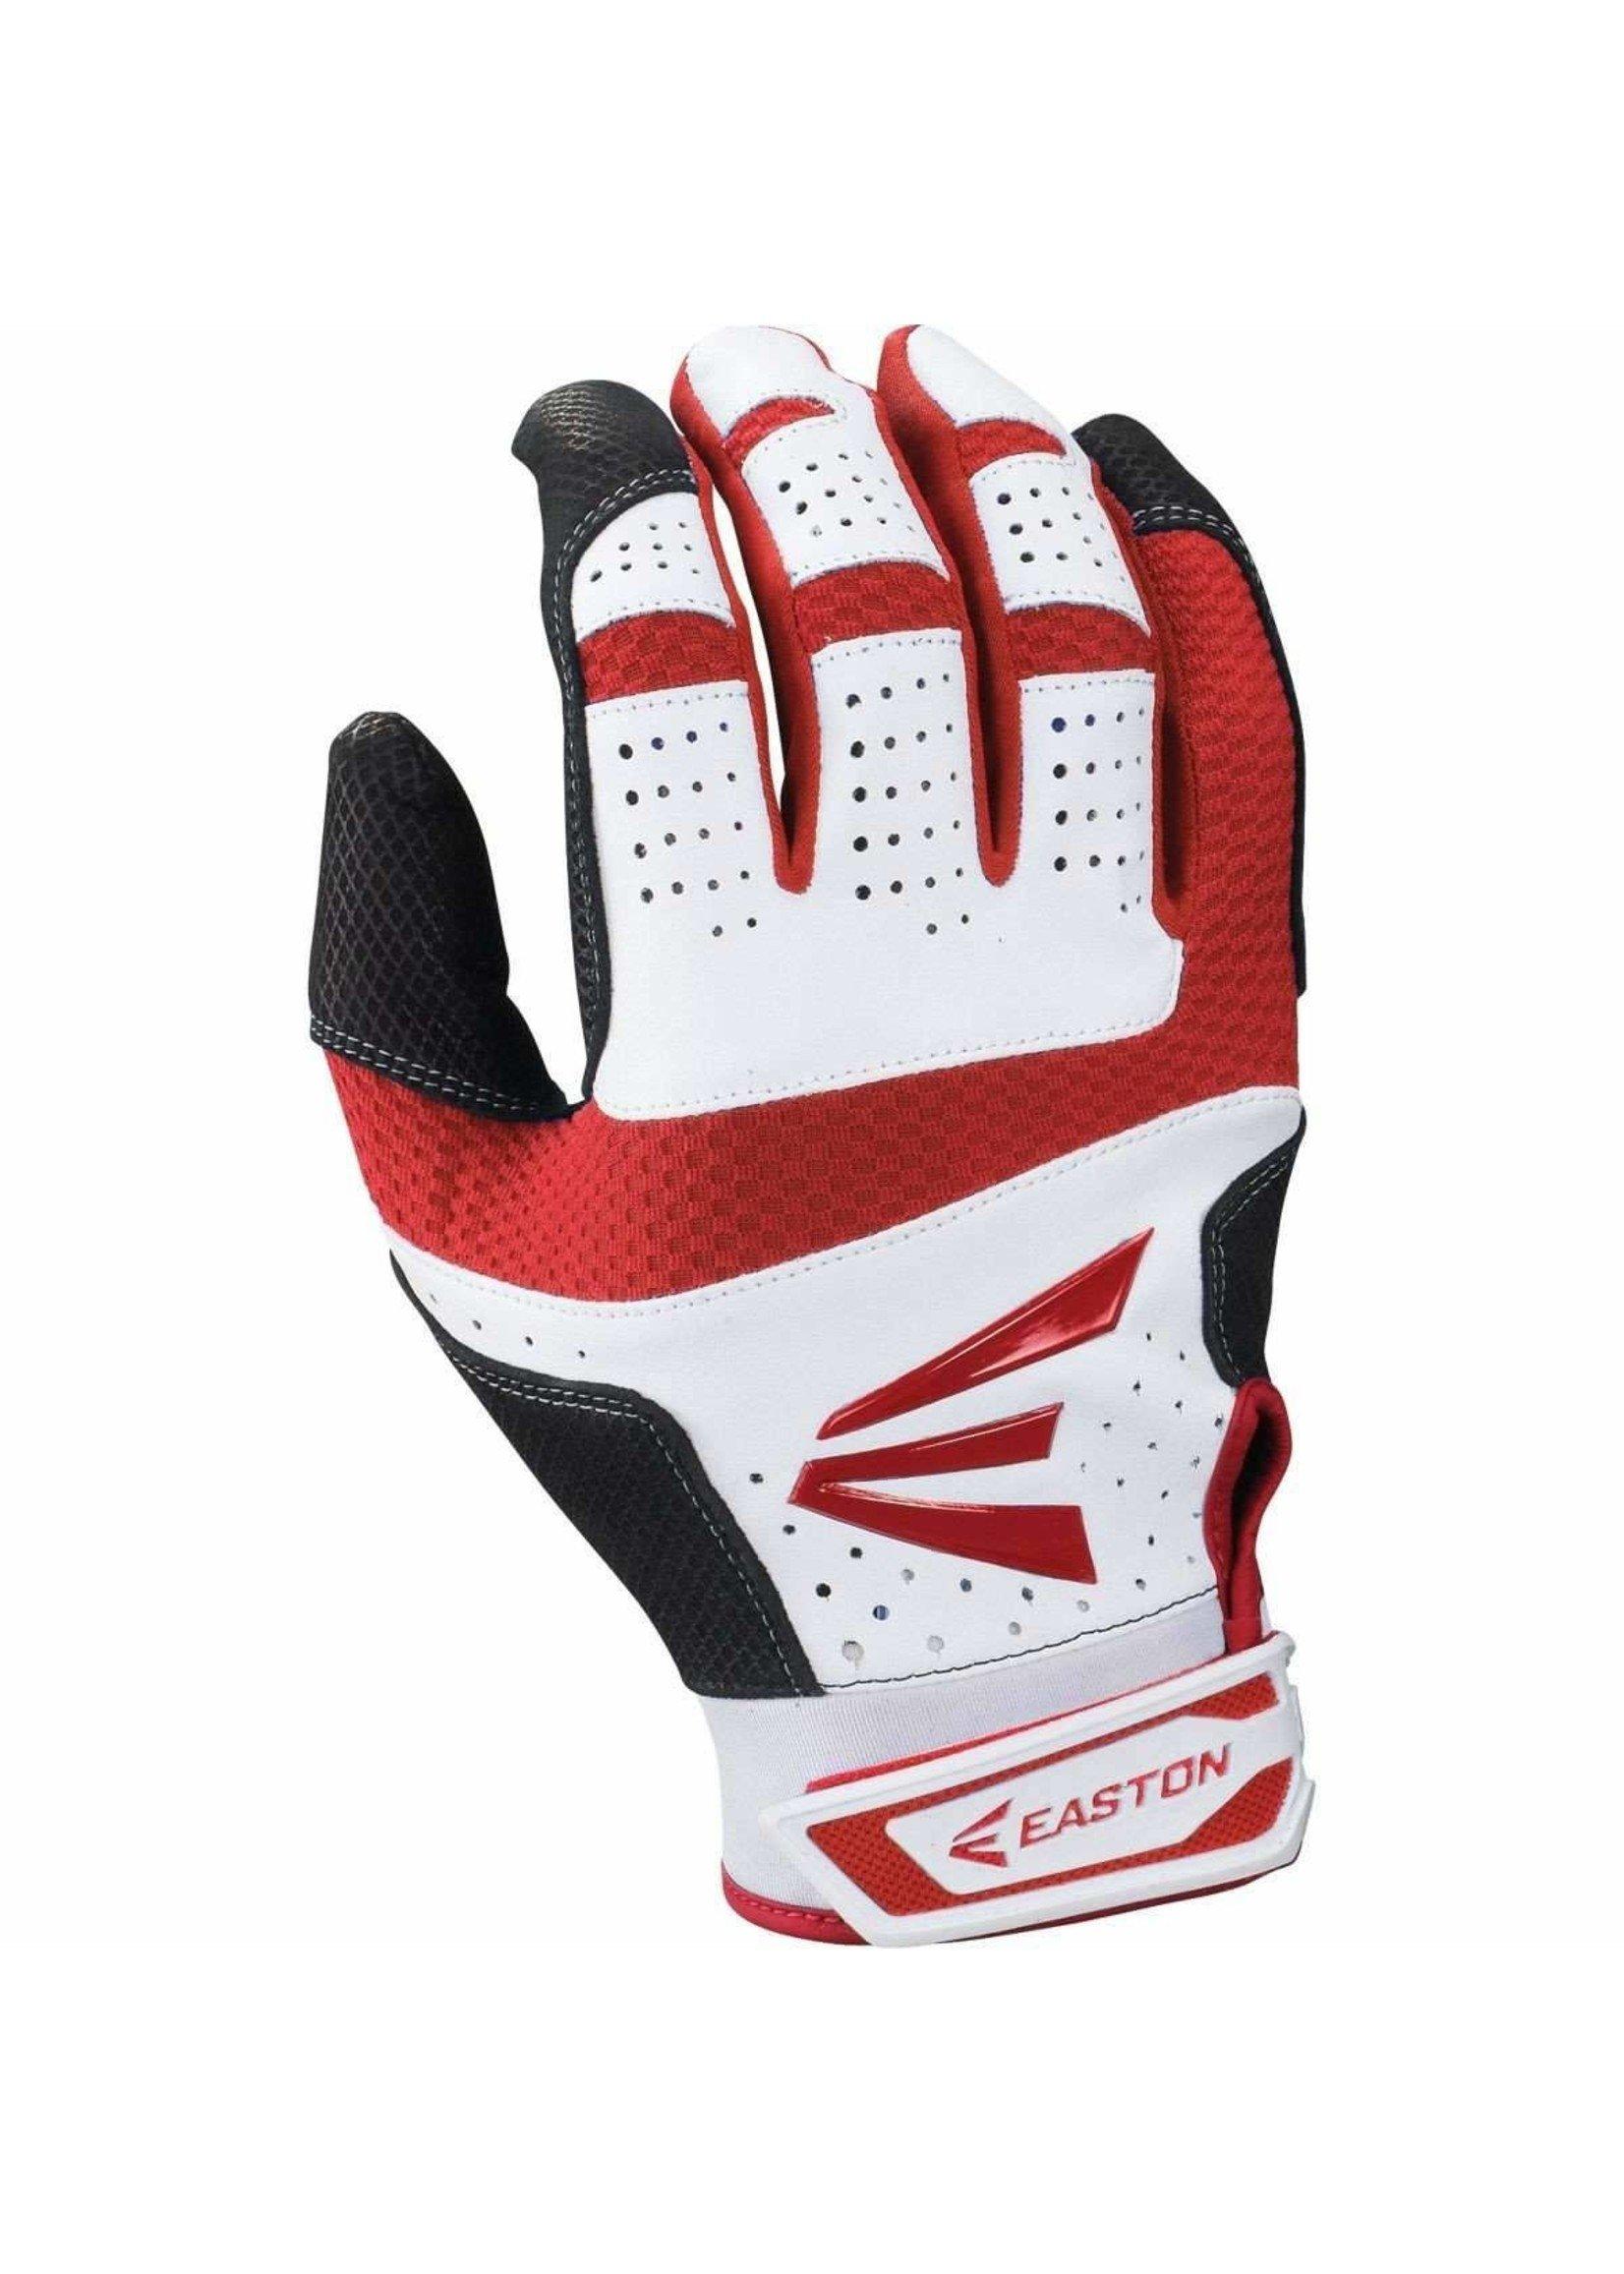 Easton Baseball (Canada) EASTON HS9 BATTING GLOVES ROUGE/BLANC ADULT